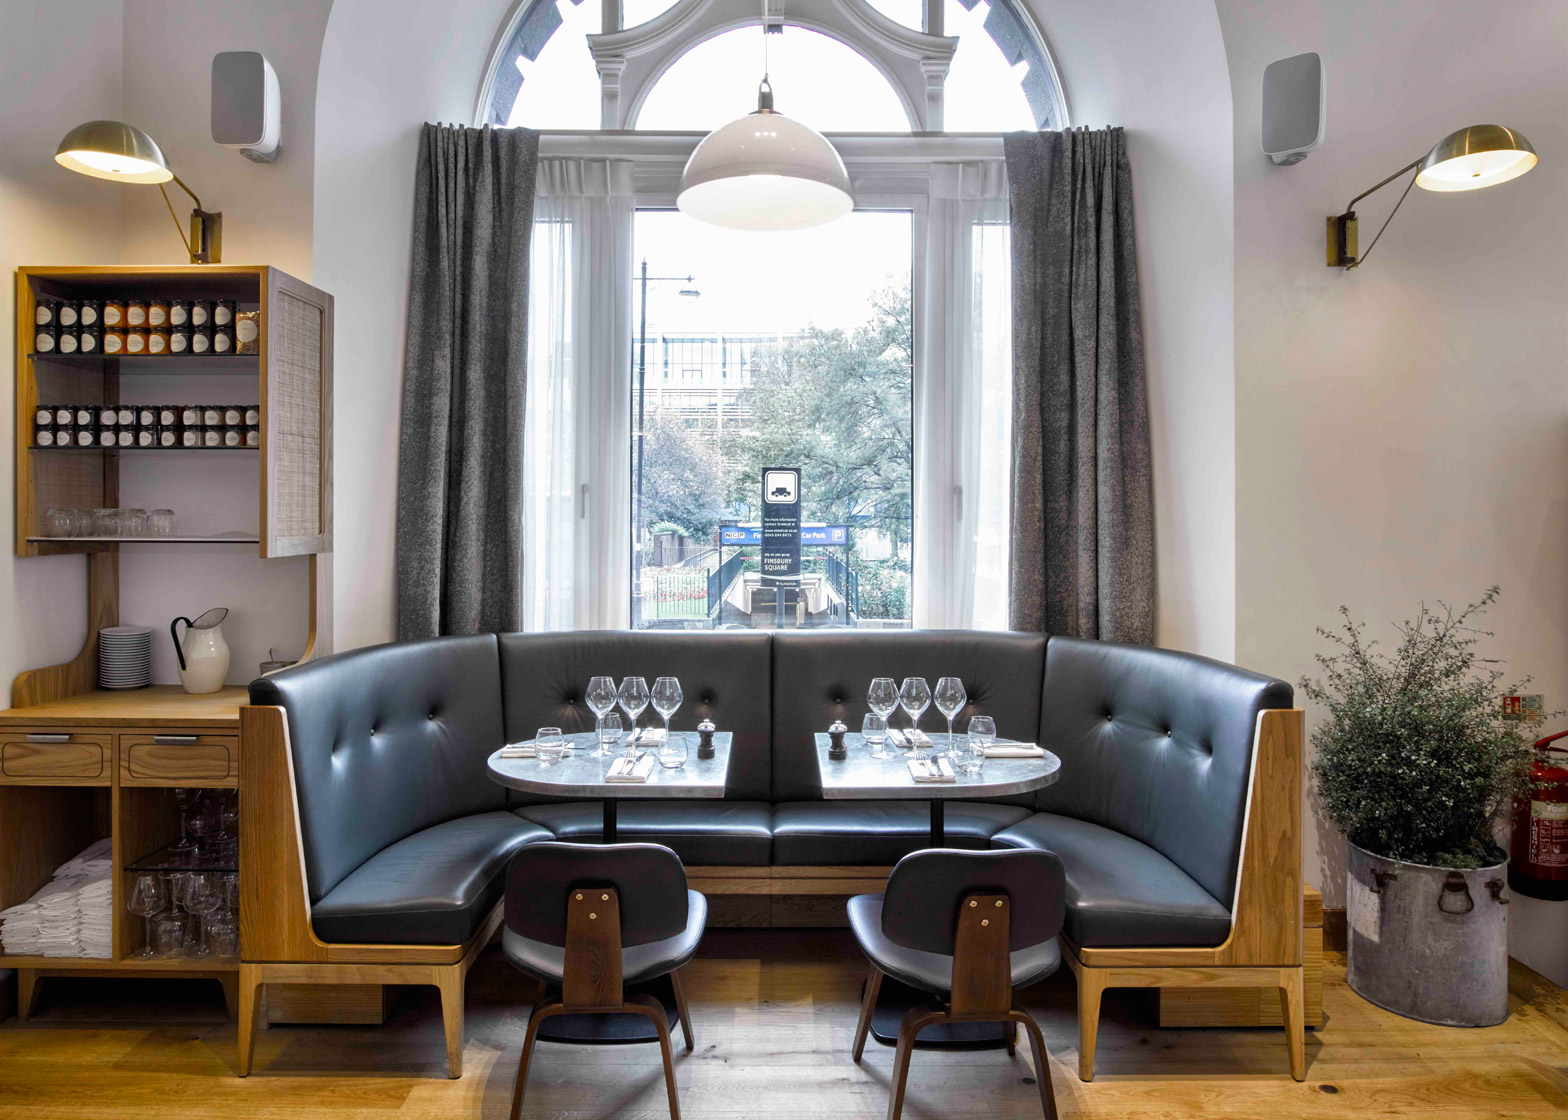 modern-pantry-avroko-restaurant-bar-interior-furniture-lighting-london-uk_dezeen_1568_13